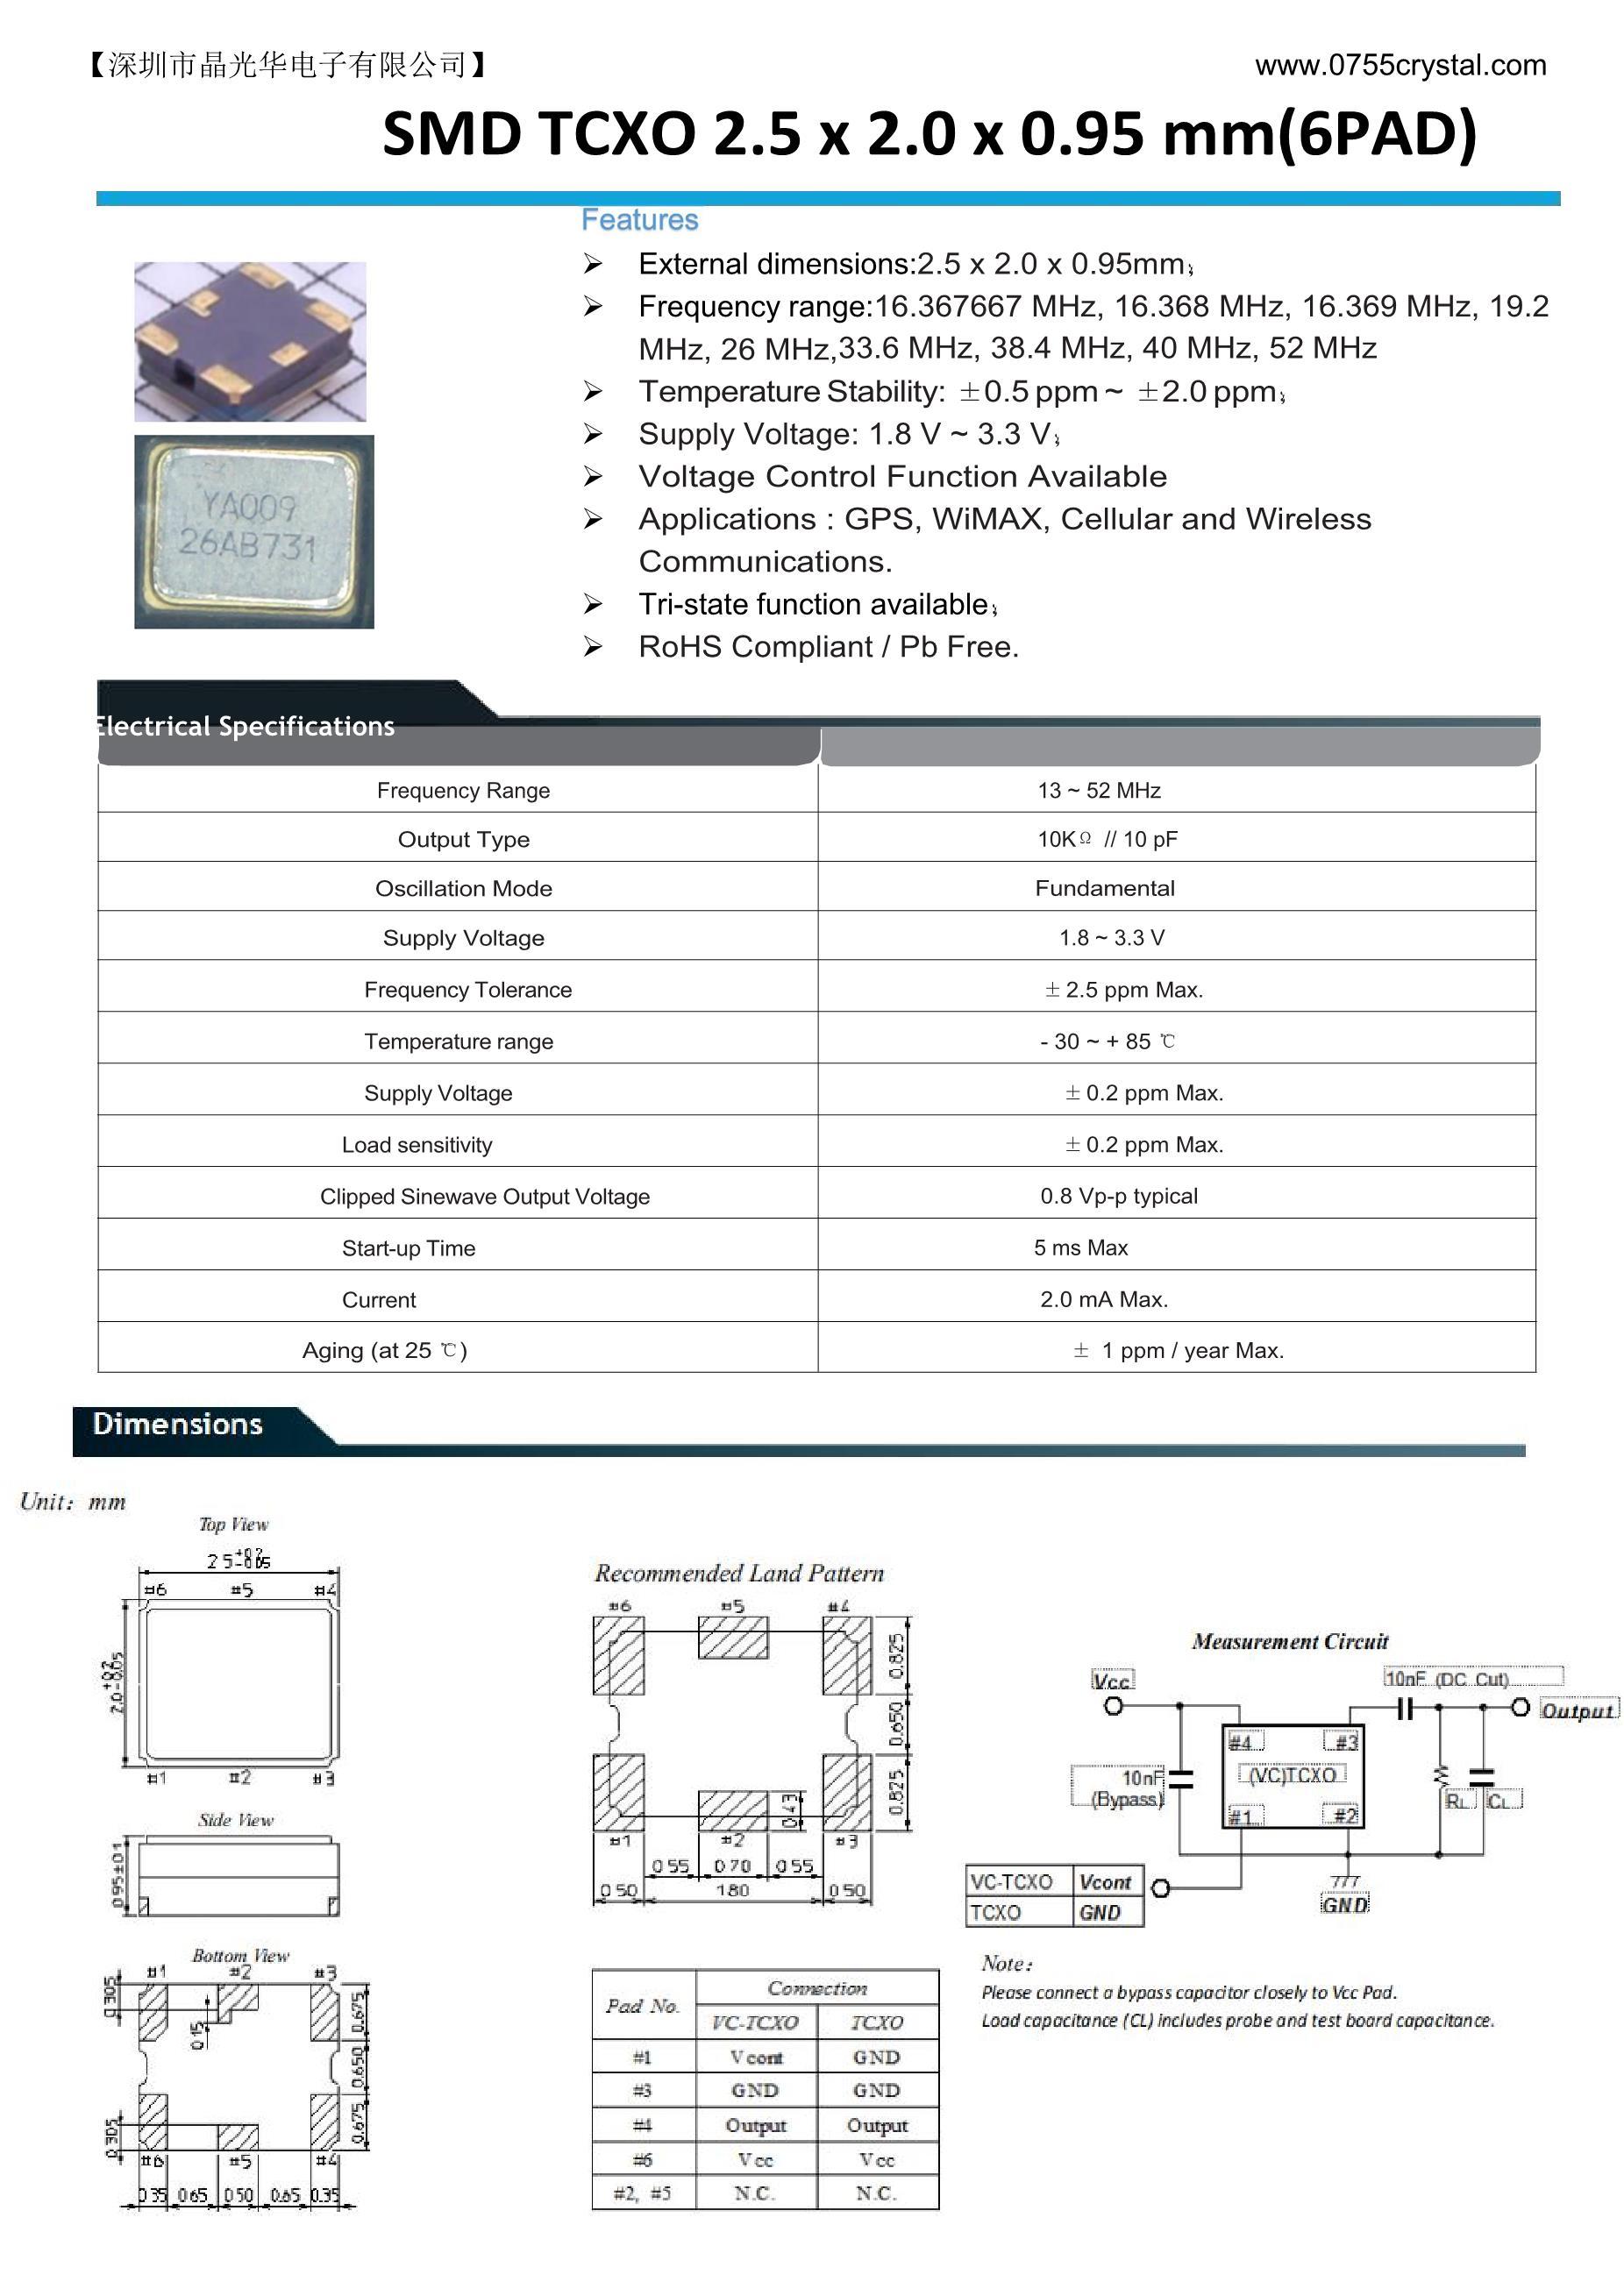 TCO-7086X1A4-19.440000MHZ's pdf picture 1